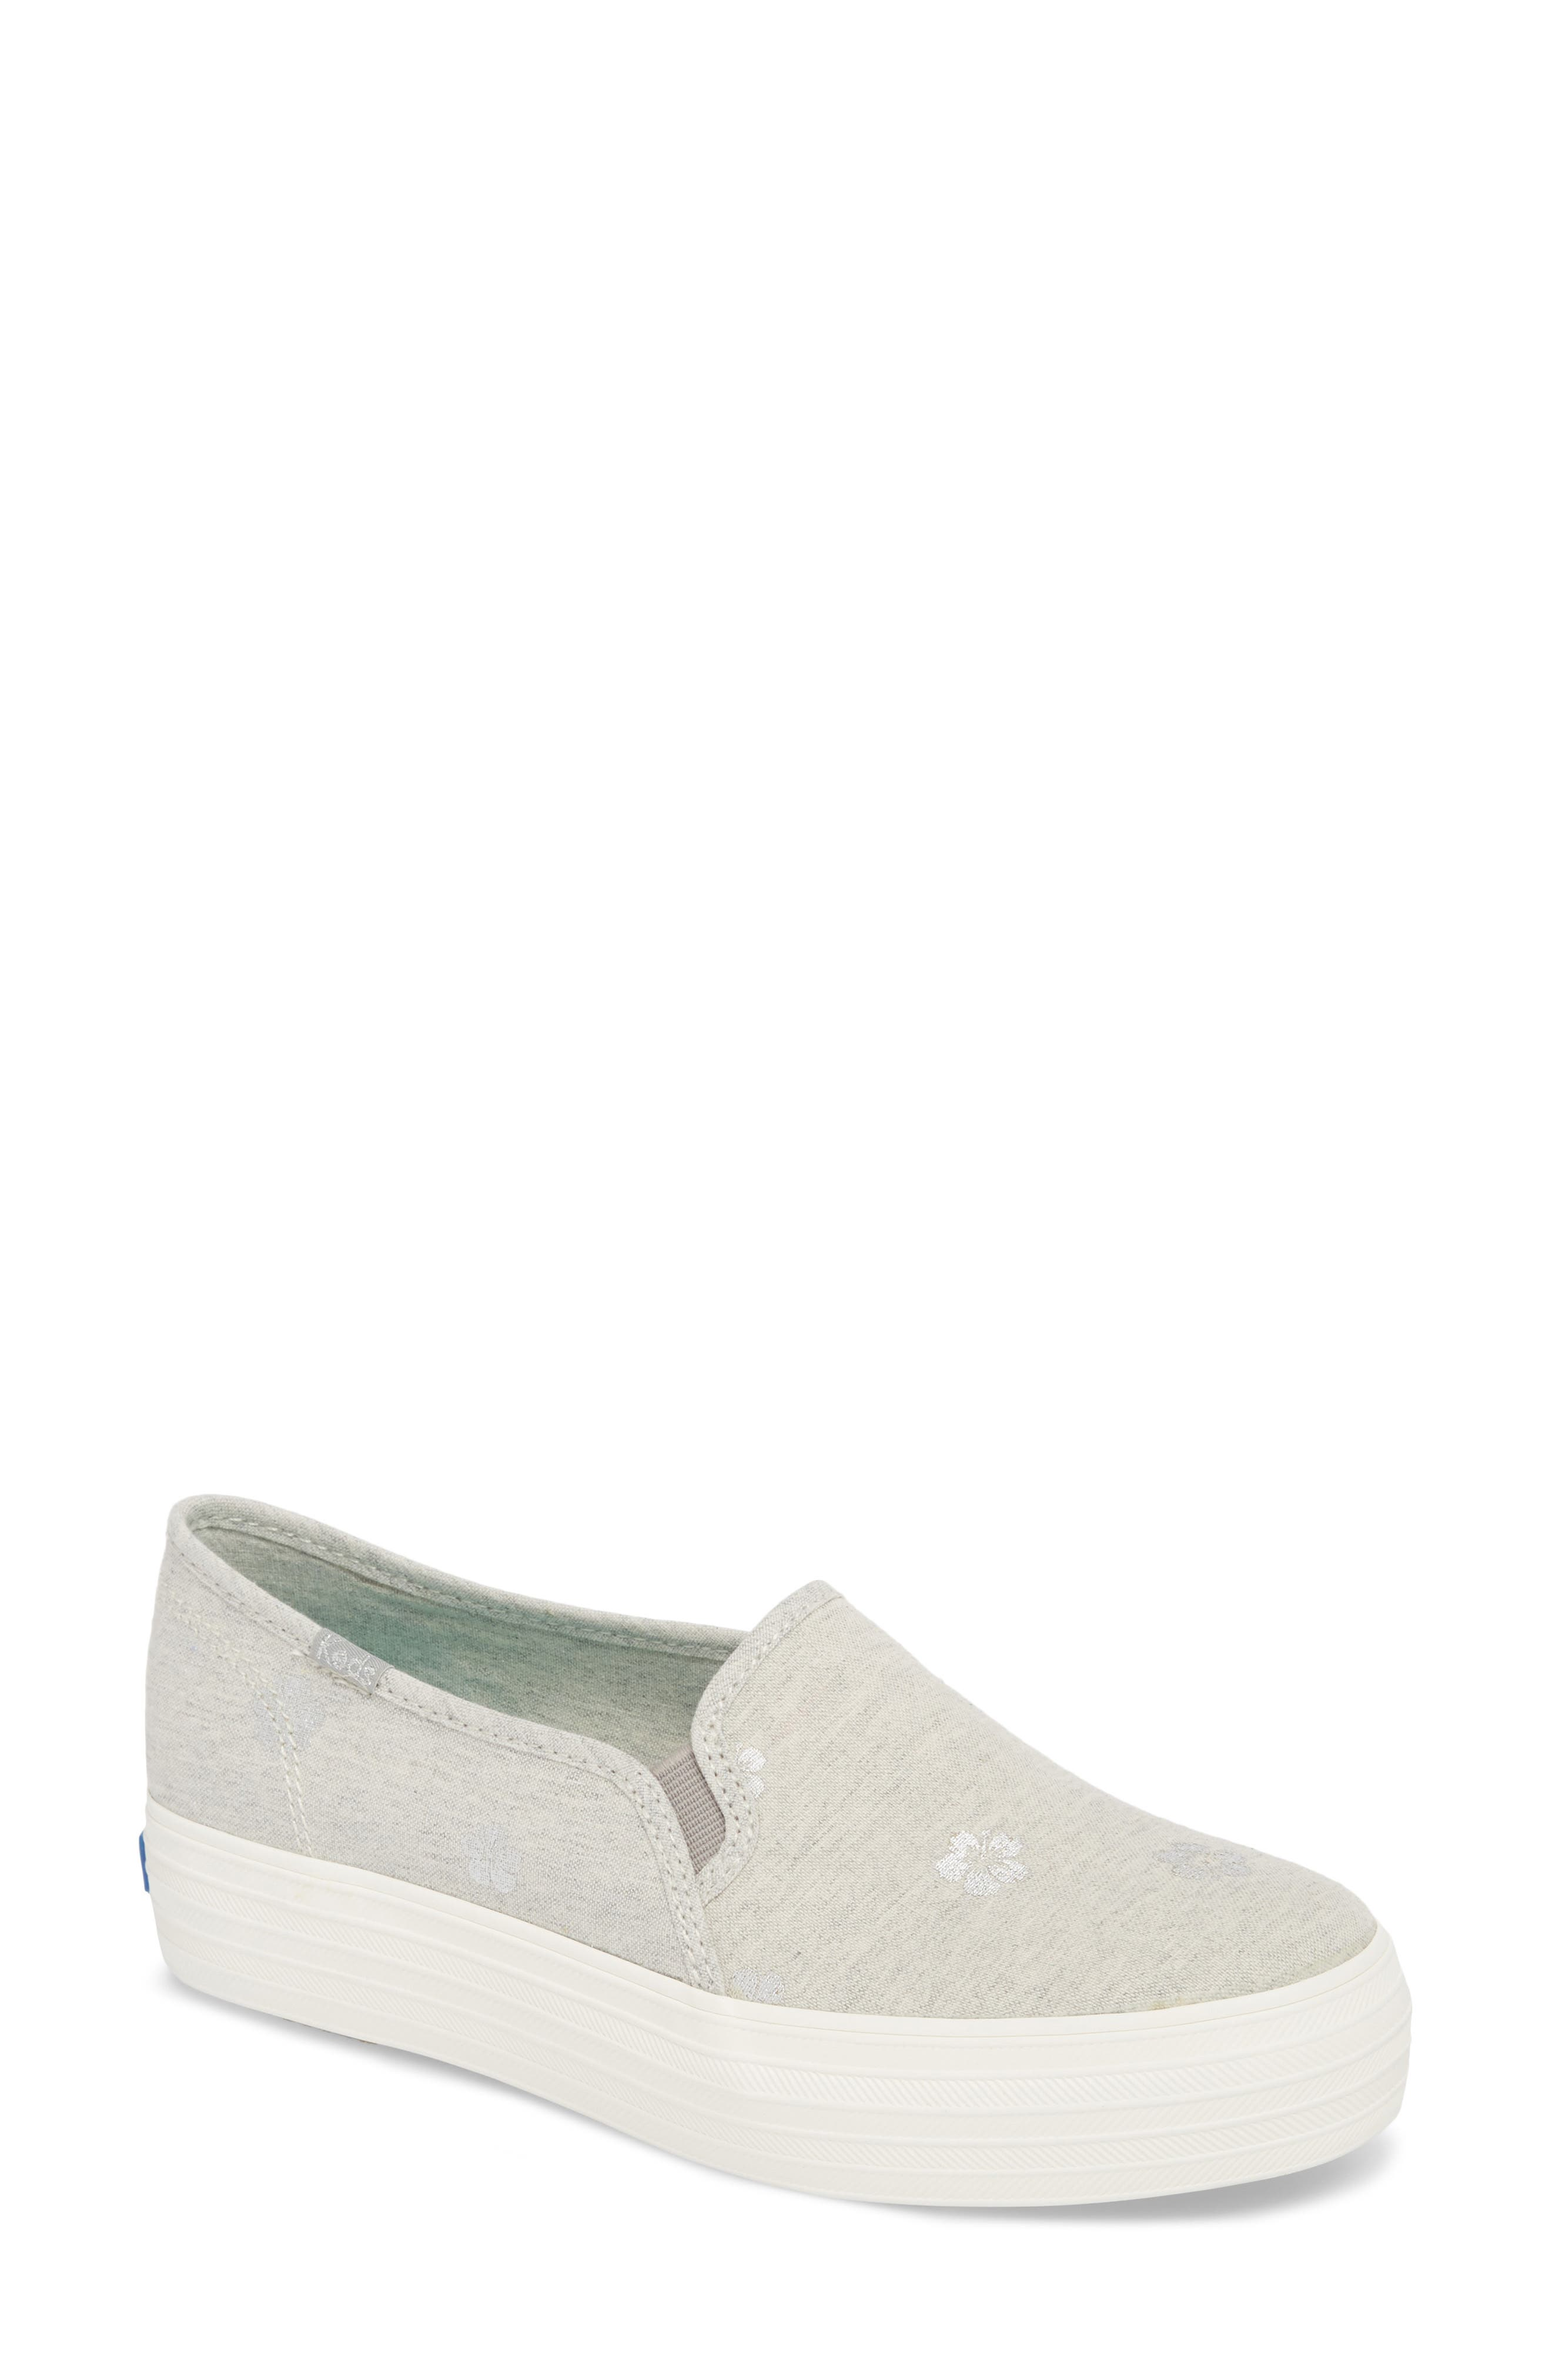 Triple Decker Hibiscus Slip-On Platform Sneaker,                         Main,                         color, 050